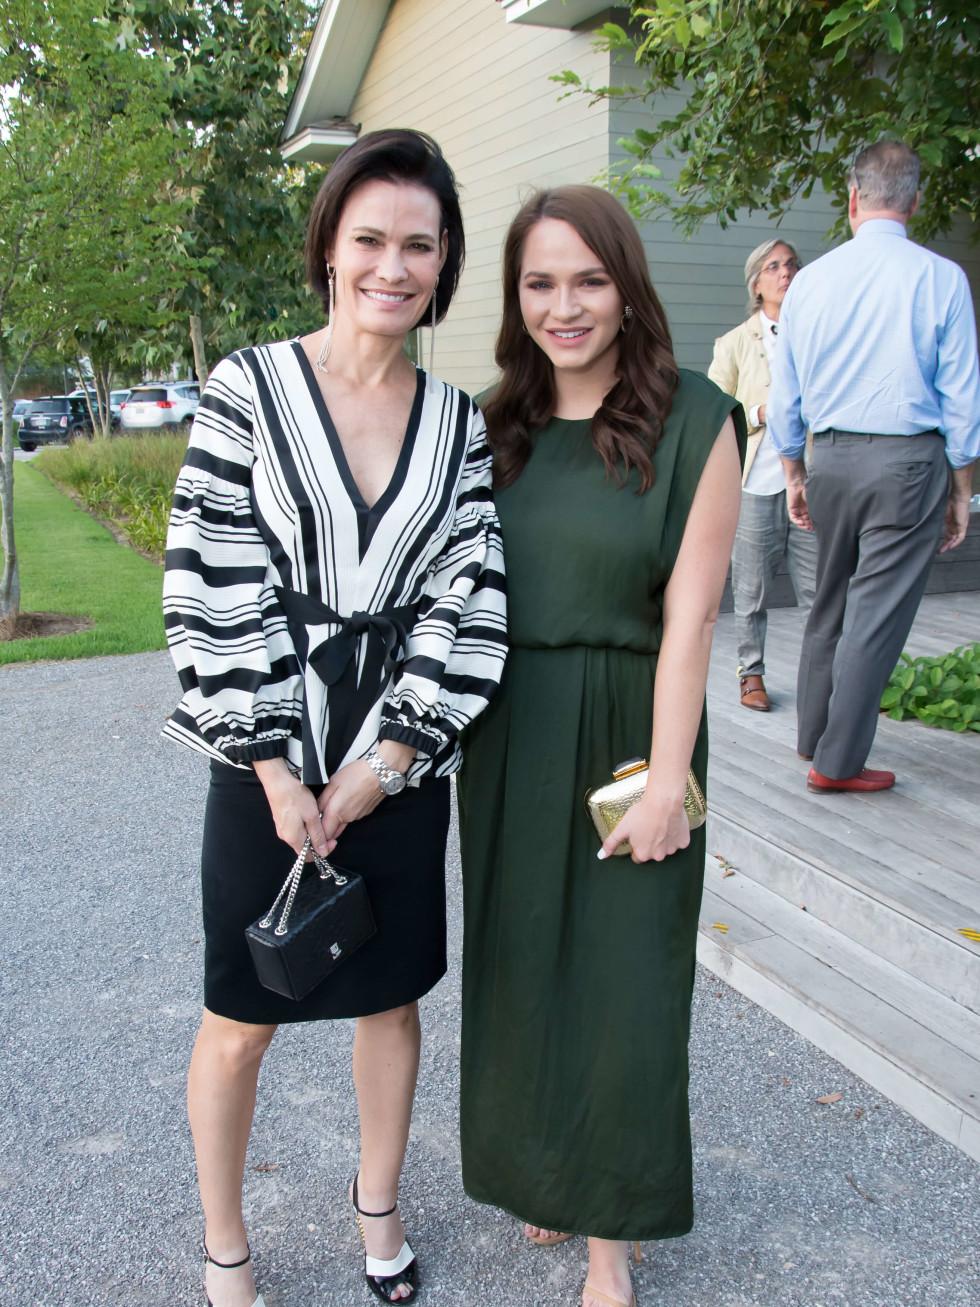 PaperCity launch party, 9/16, Francine Ballard, Hannah Swiggard